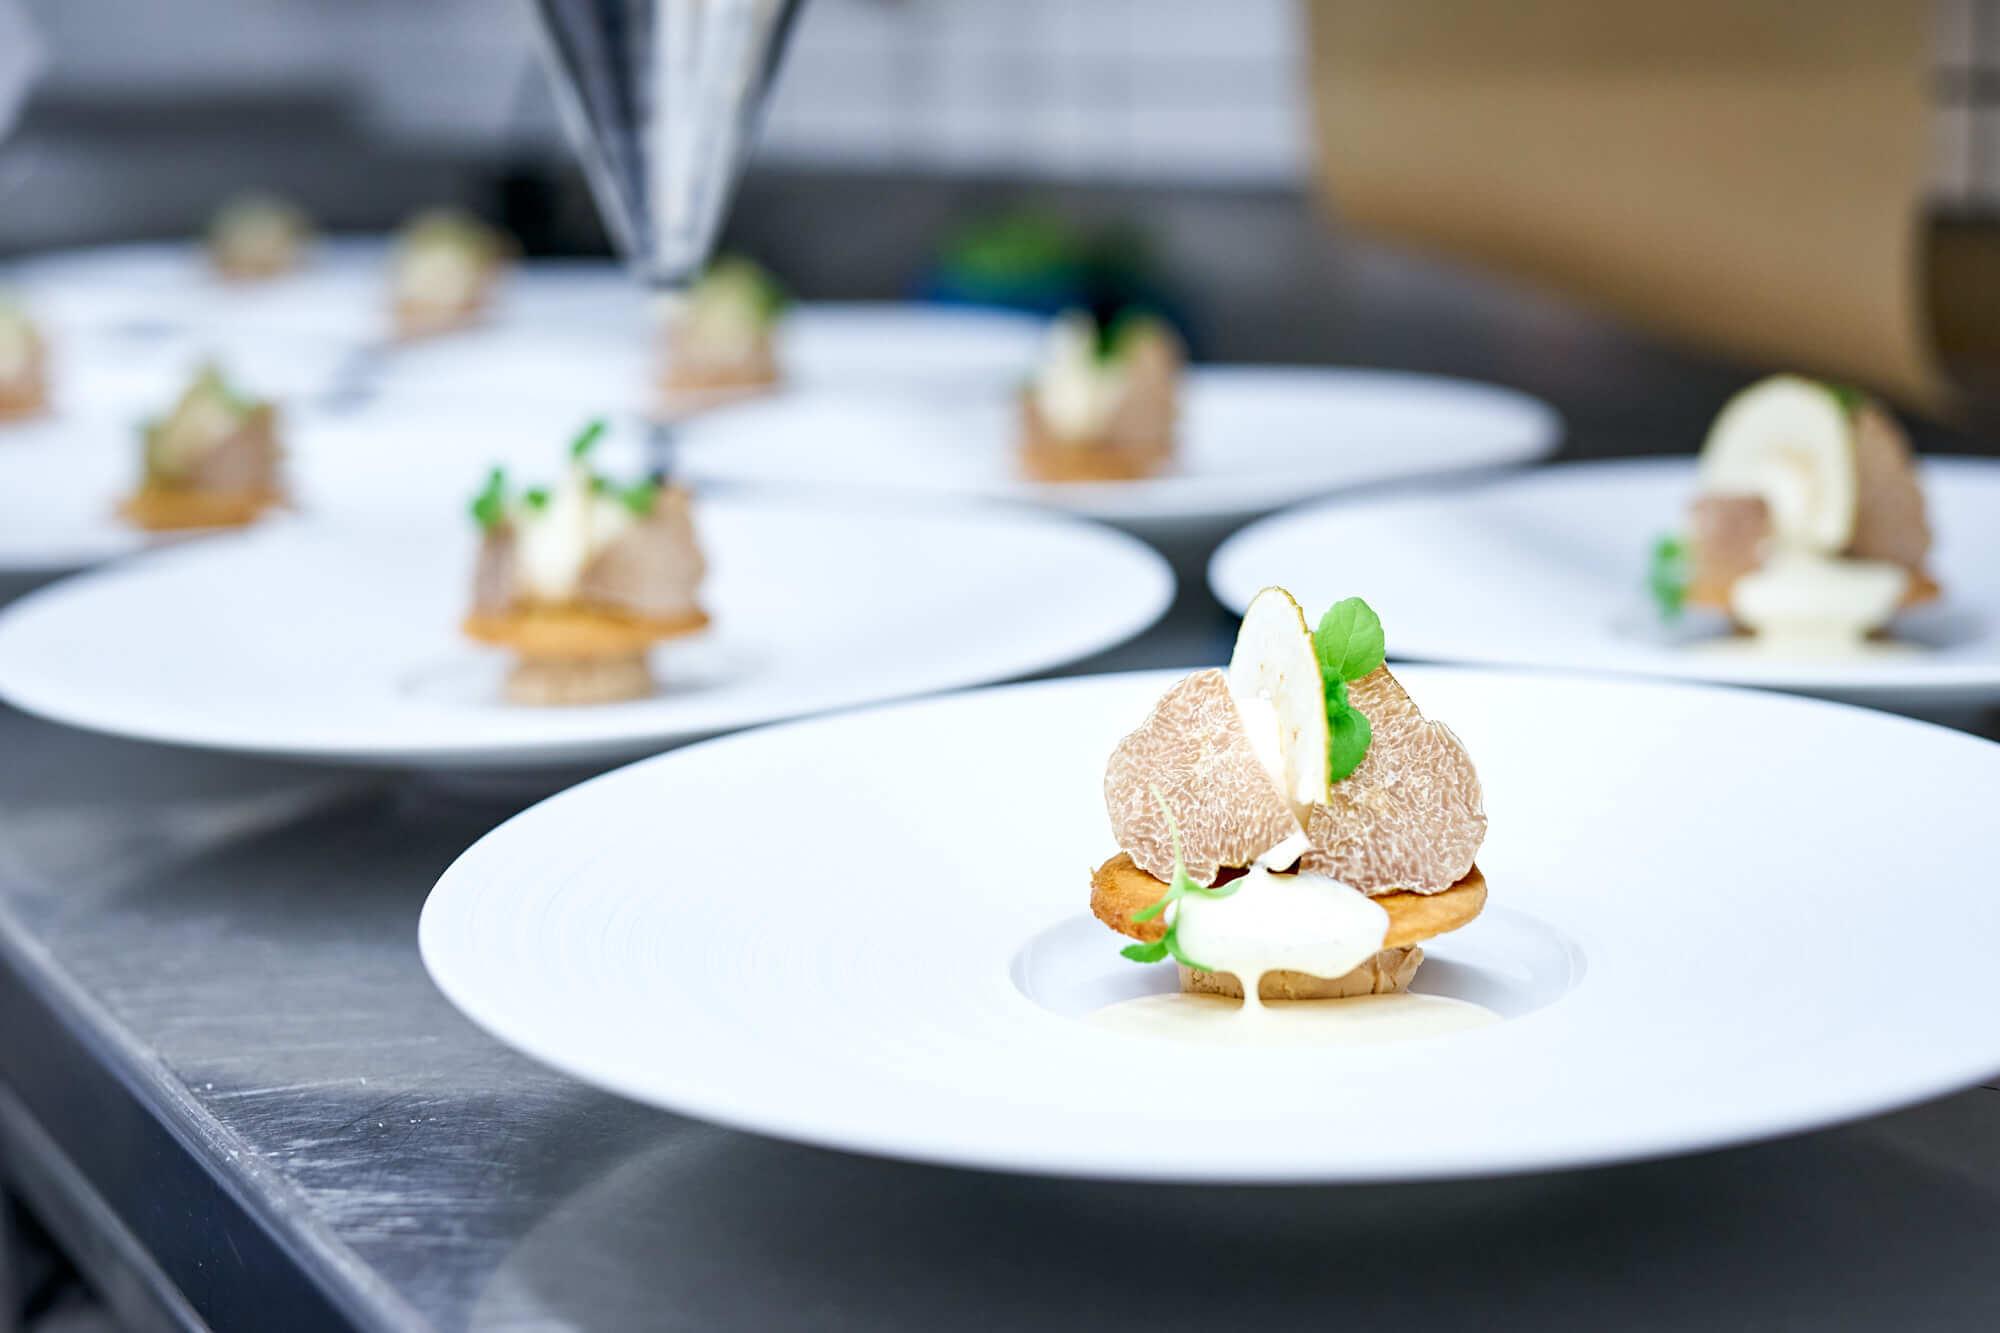 Trüffel & Champagner Dinner 2019, Kilian Stuba, Ifen Hotel - Bretonischer Mürbteig, Valrhona Orelys Canache, Boskoop Apfel, Albatrüffel, Vanillerahm - Dessert